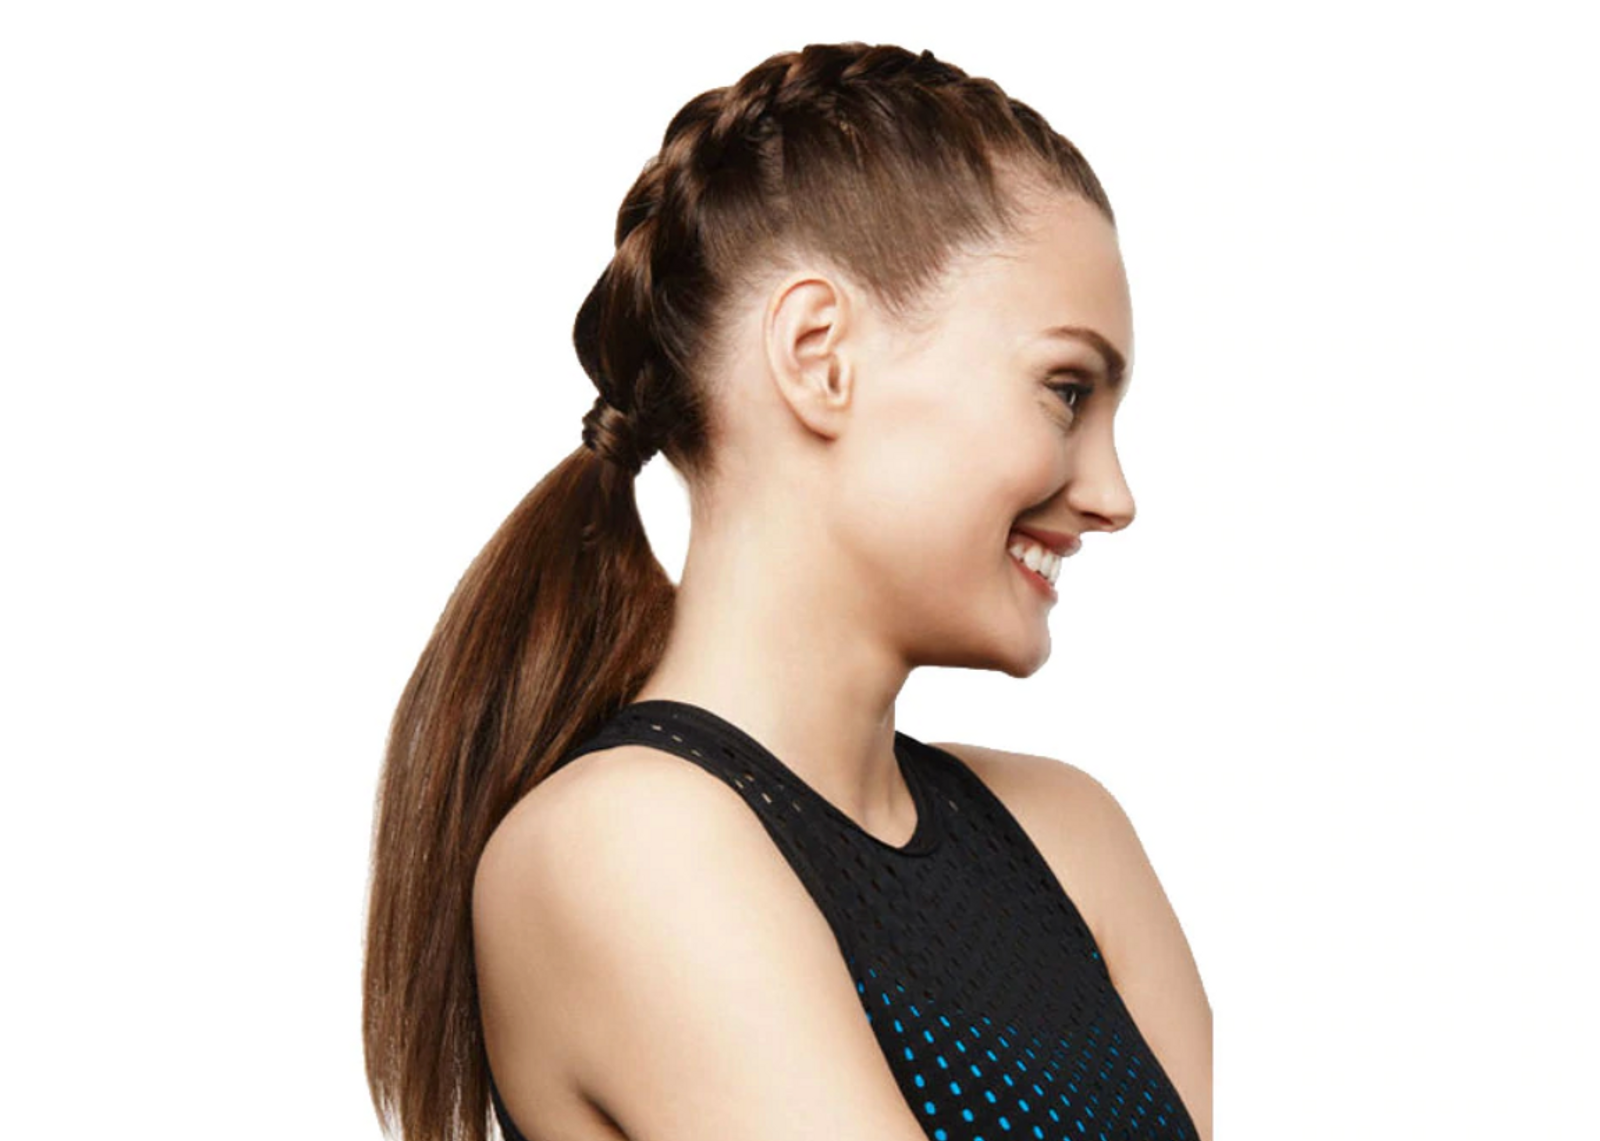 Girl in braided ponytail